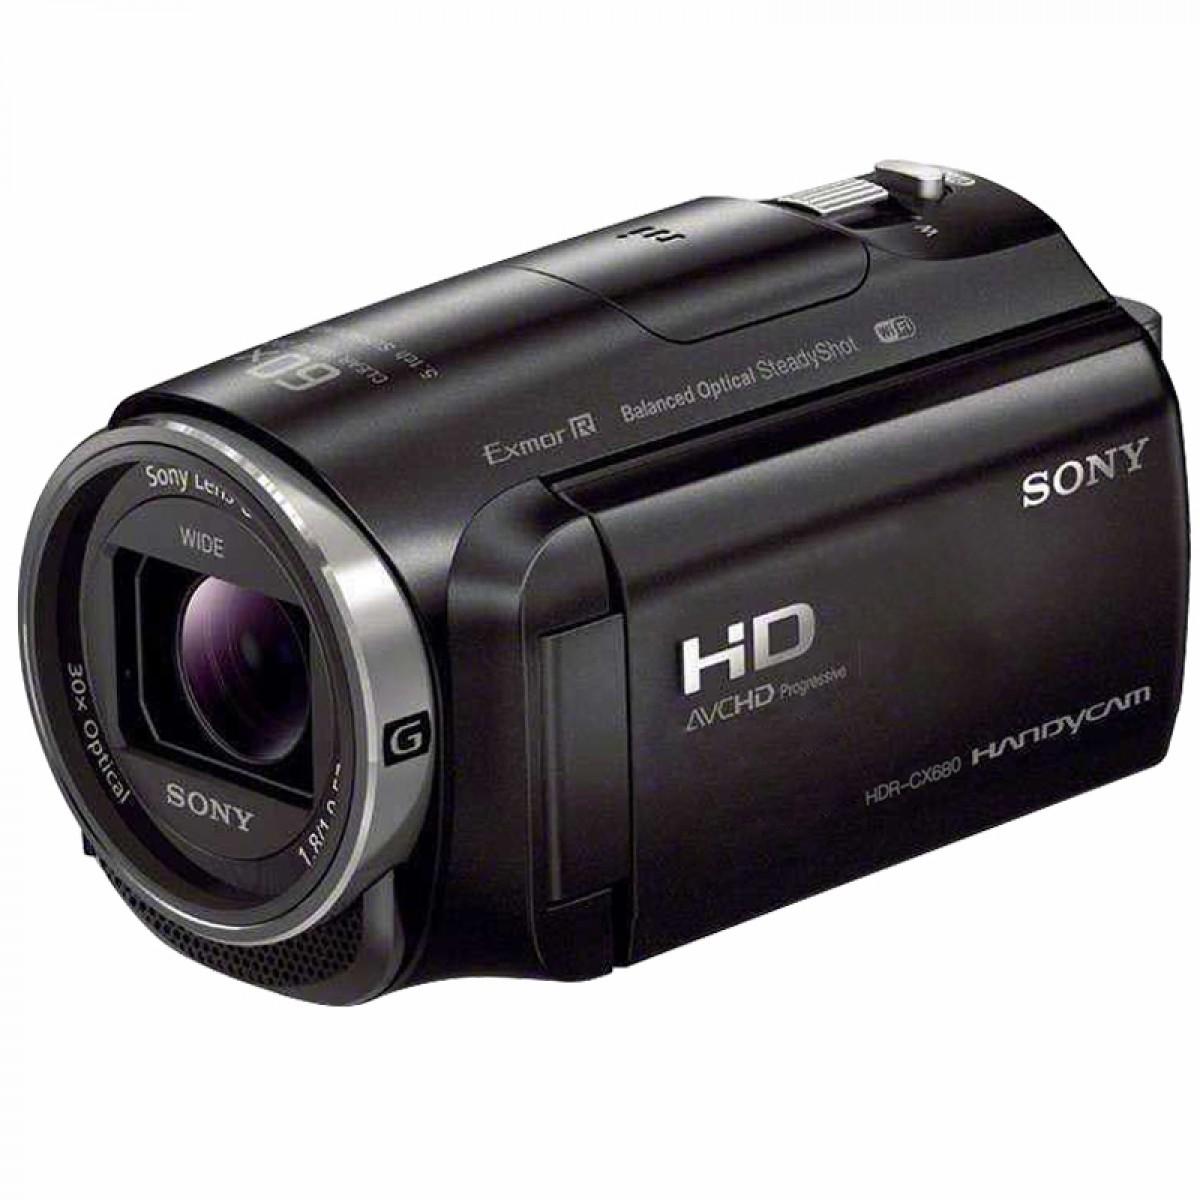 Sony/索尼 HDR-CX680 五轴防抖30倍光学变焦高清DV 直播婚庆触屏数码摄相机